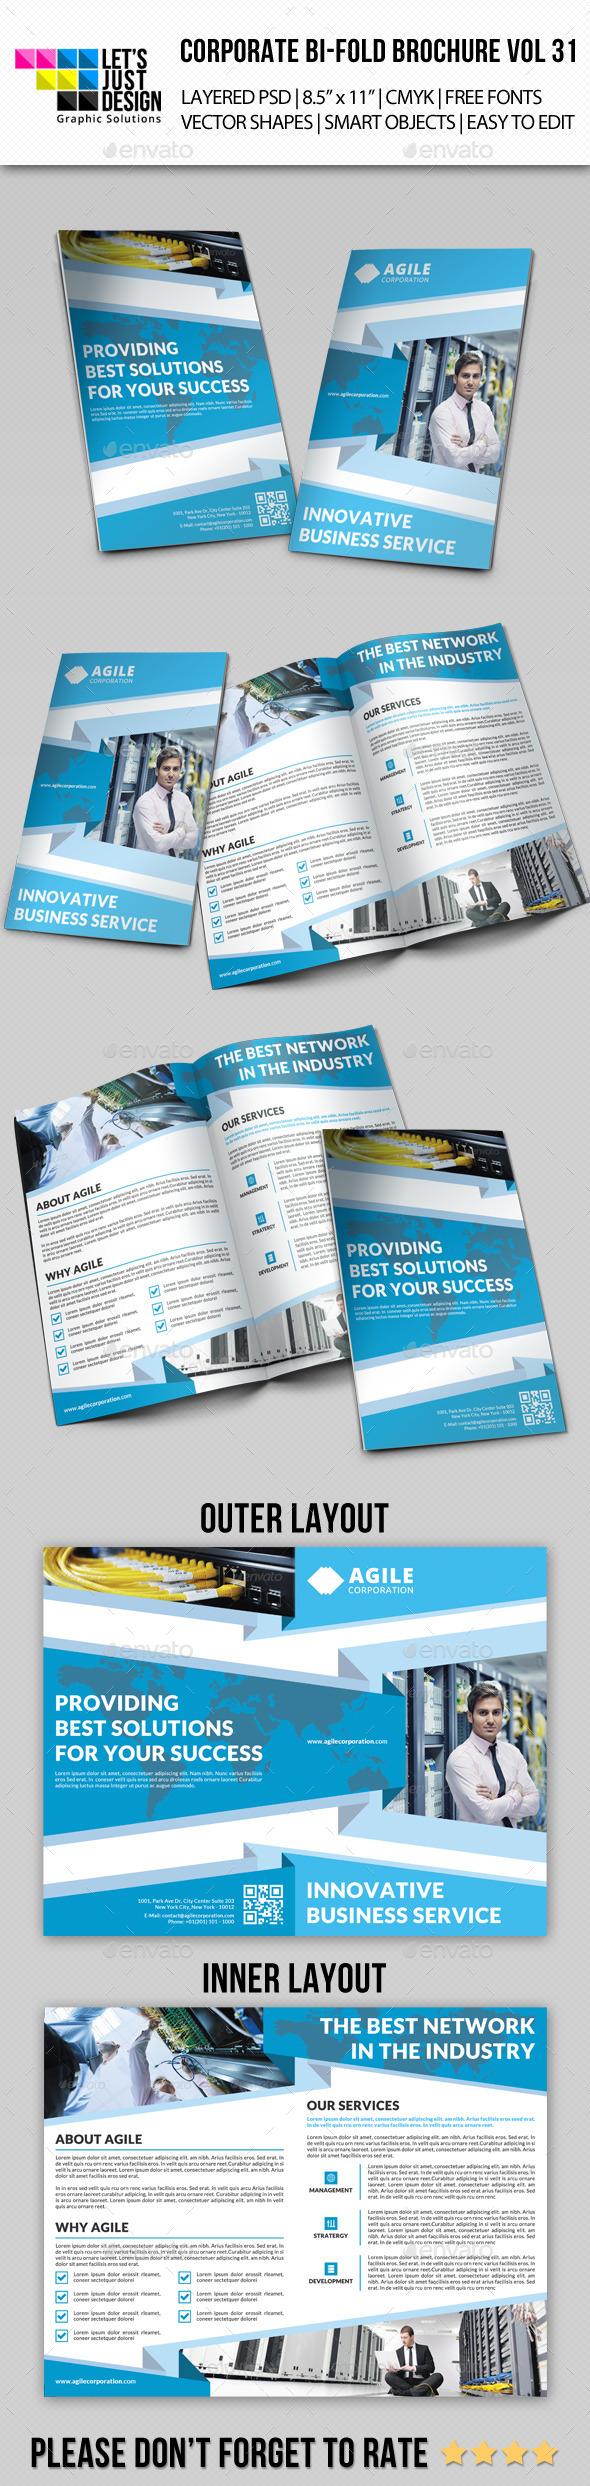 GraphicRiver Creative Corporate Bi-Fold Brochure Vol 31 10172936